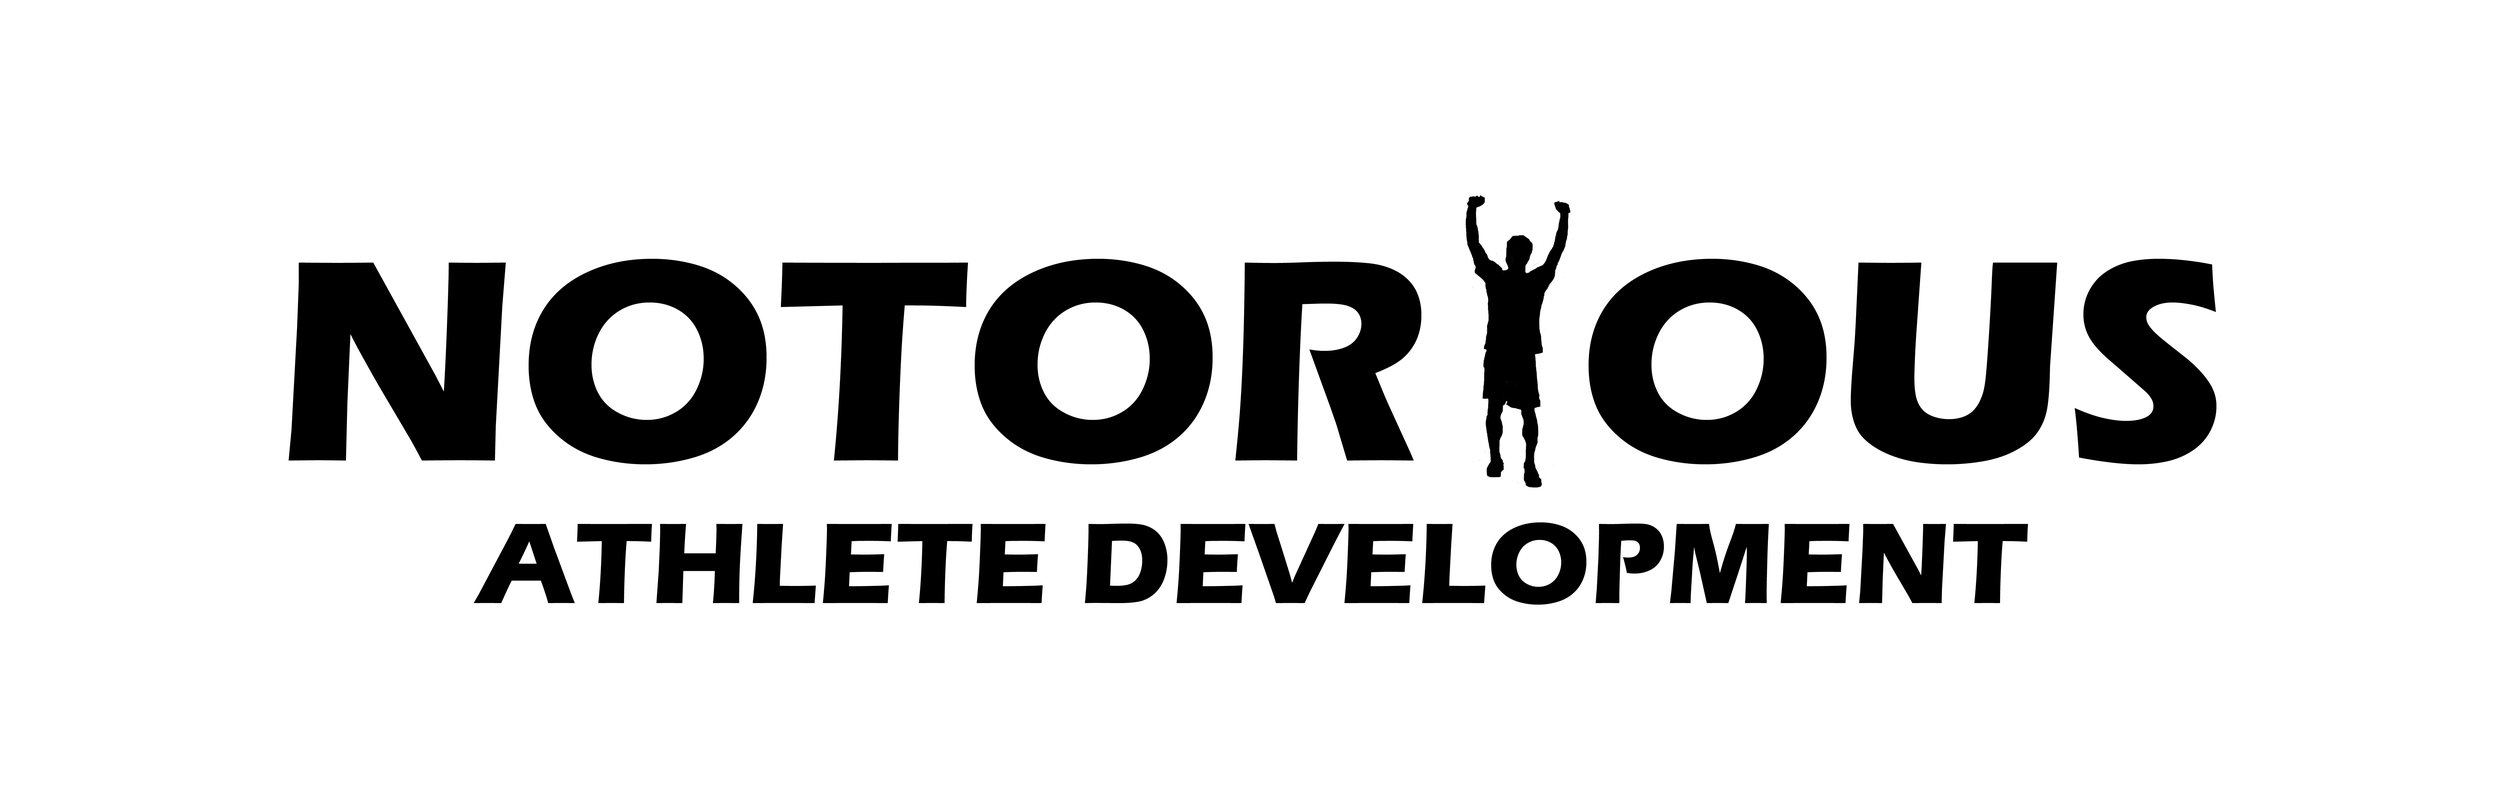 Notorious Athlete Development -